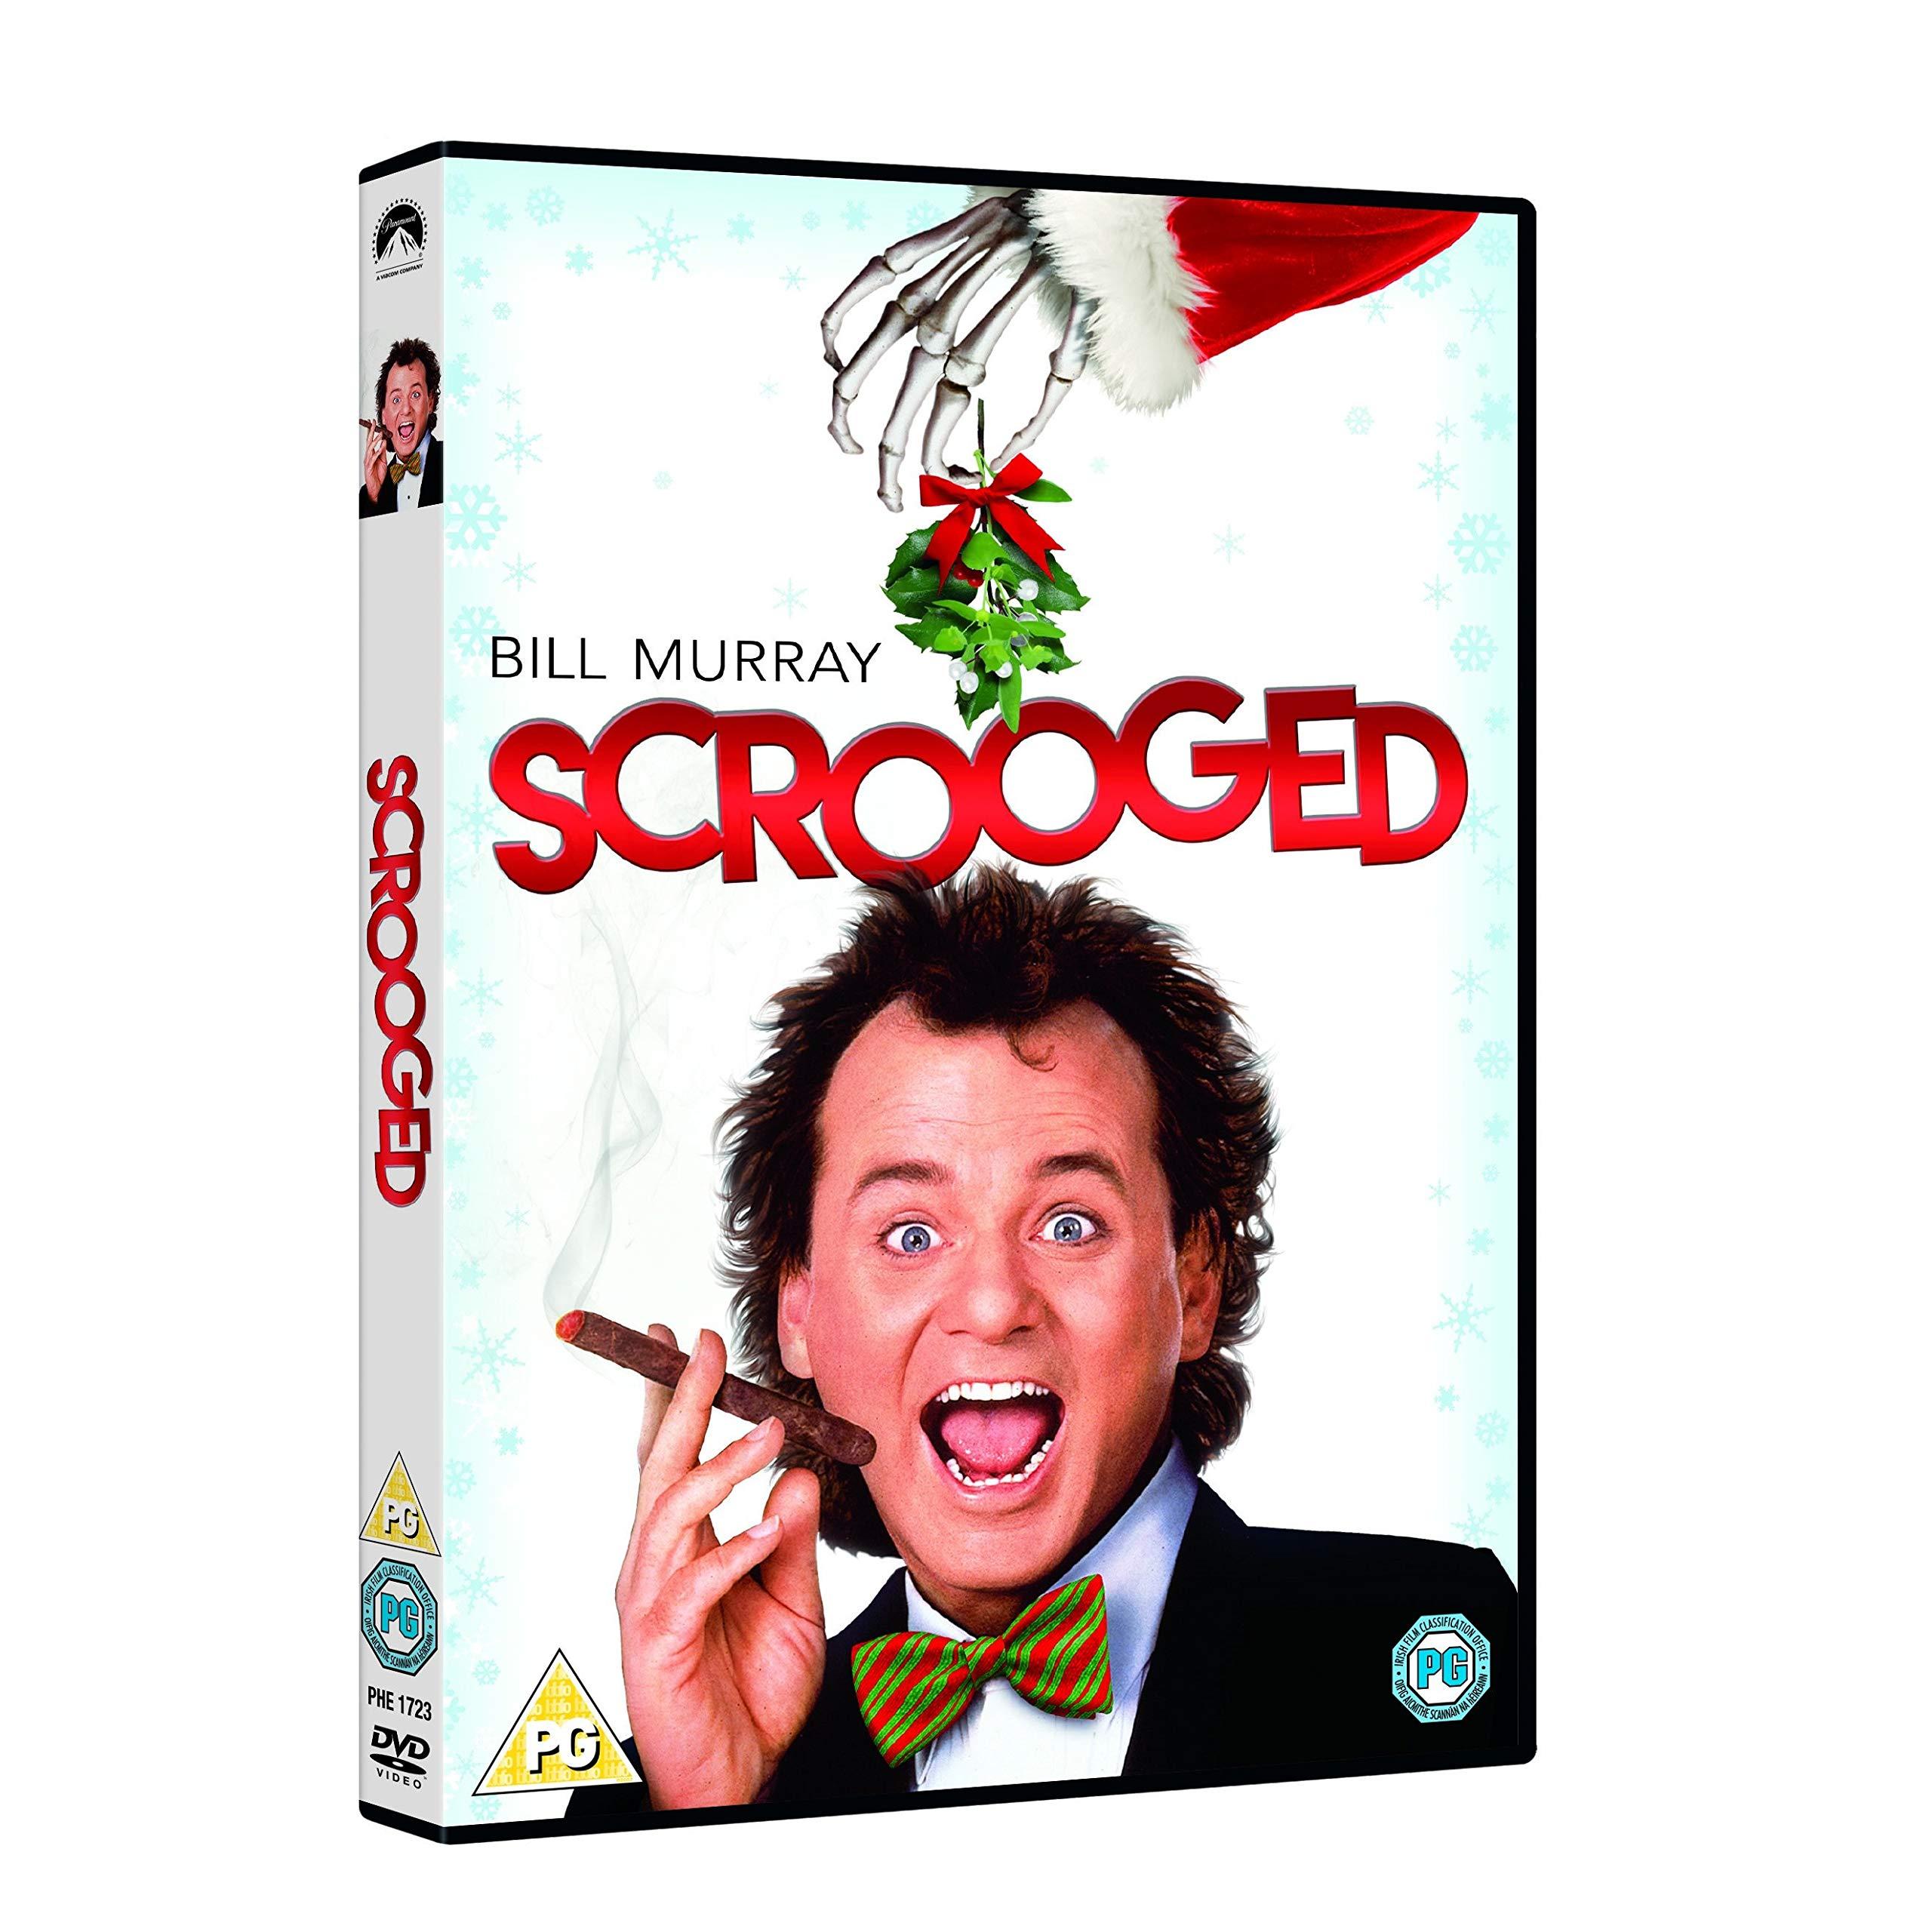 Scrooged (2012 Re-pack) [DVD]